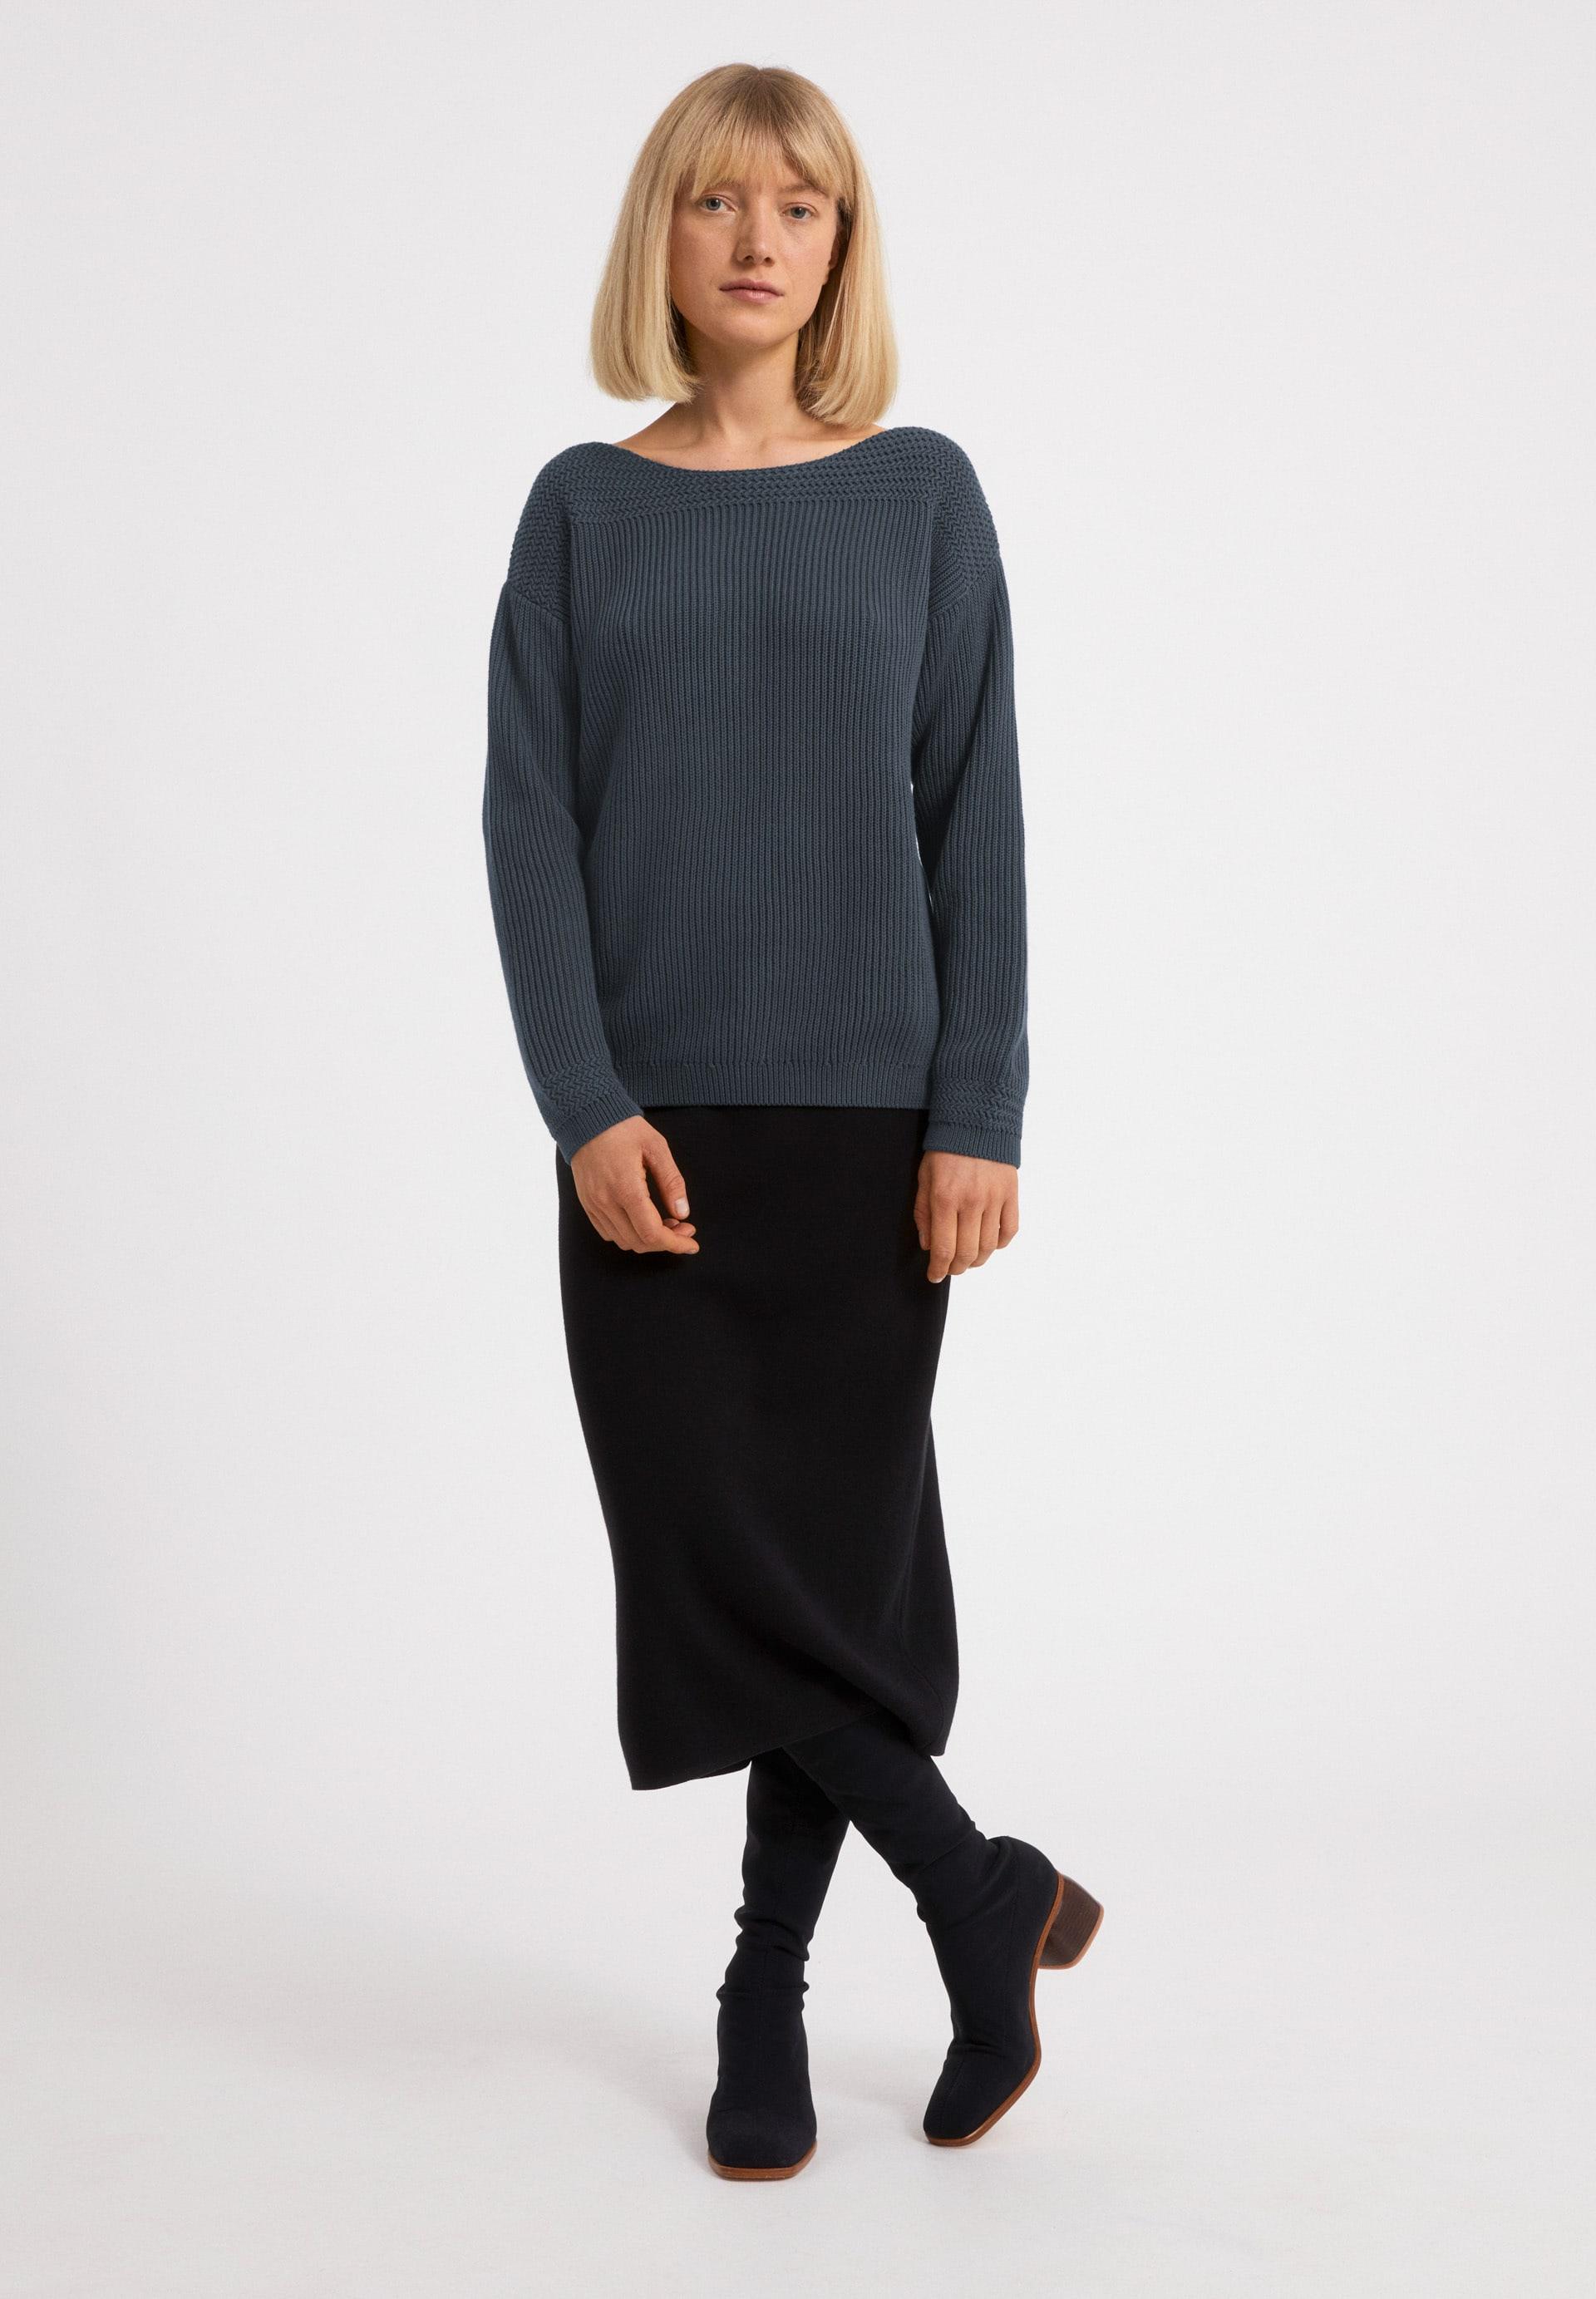 RAACHELA EARTHCOLORS® Sweater made of Organic Cotton